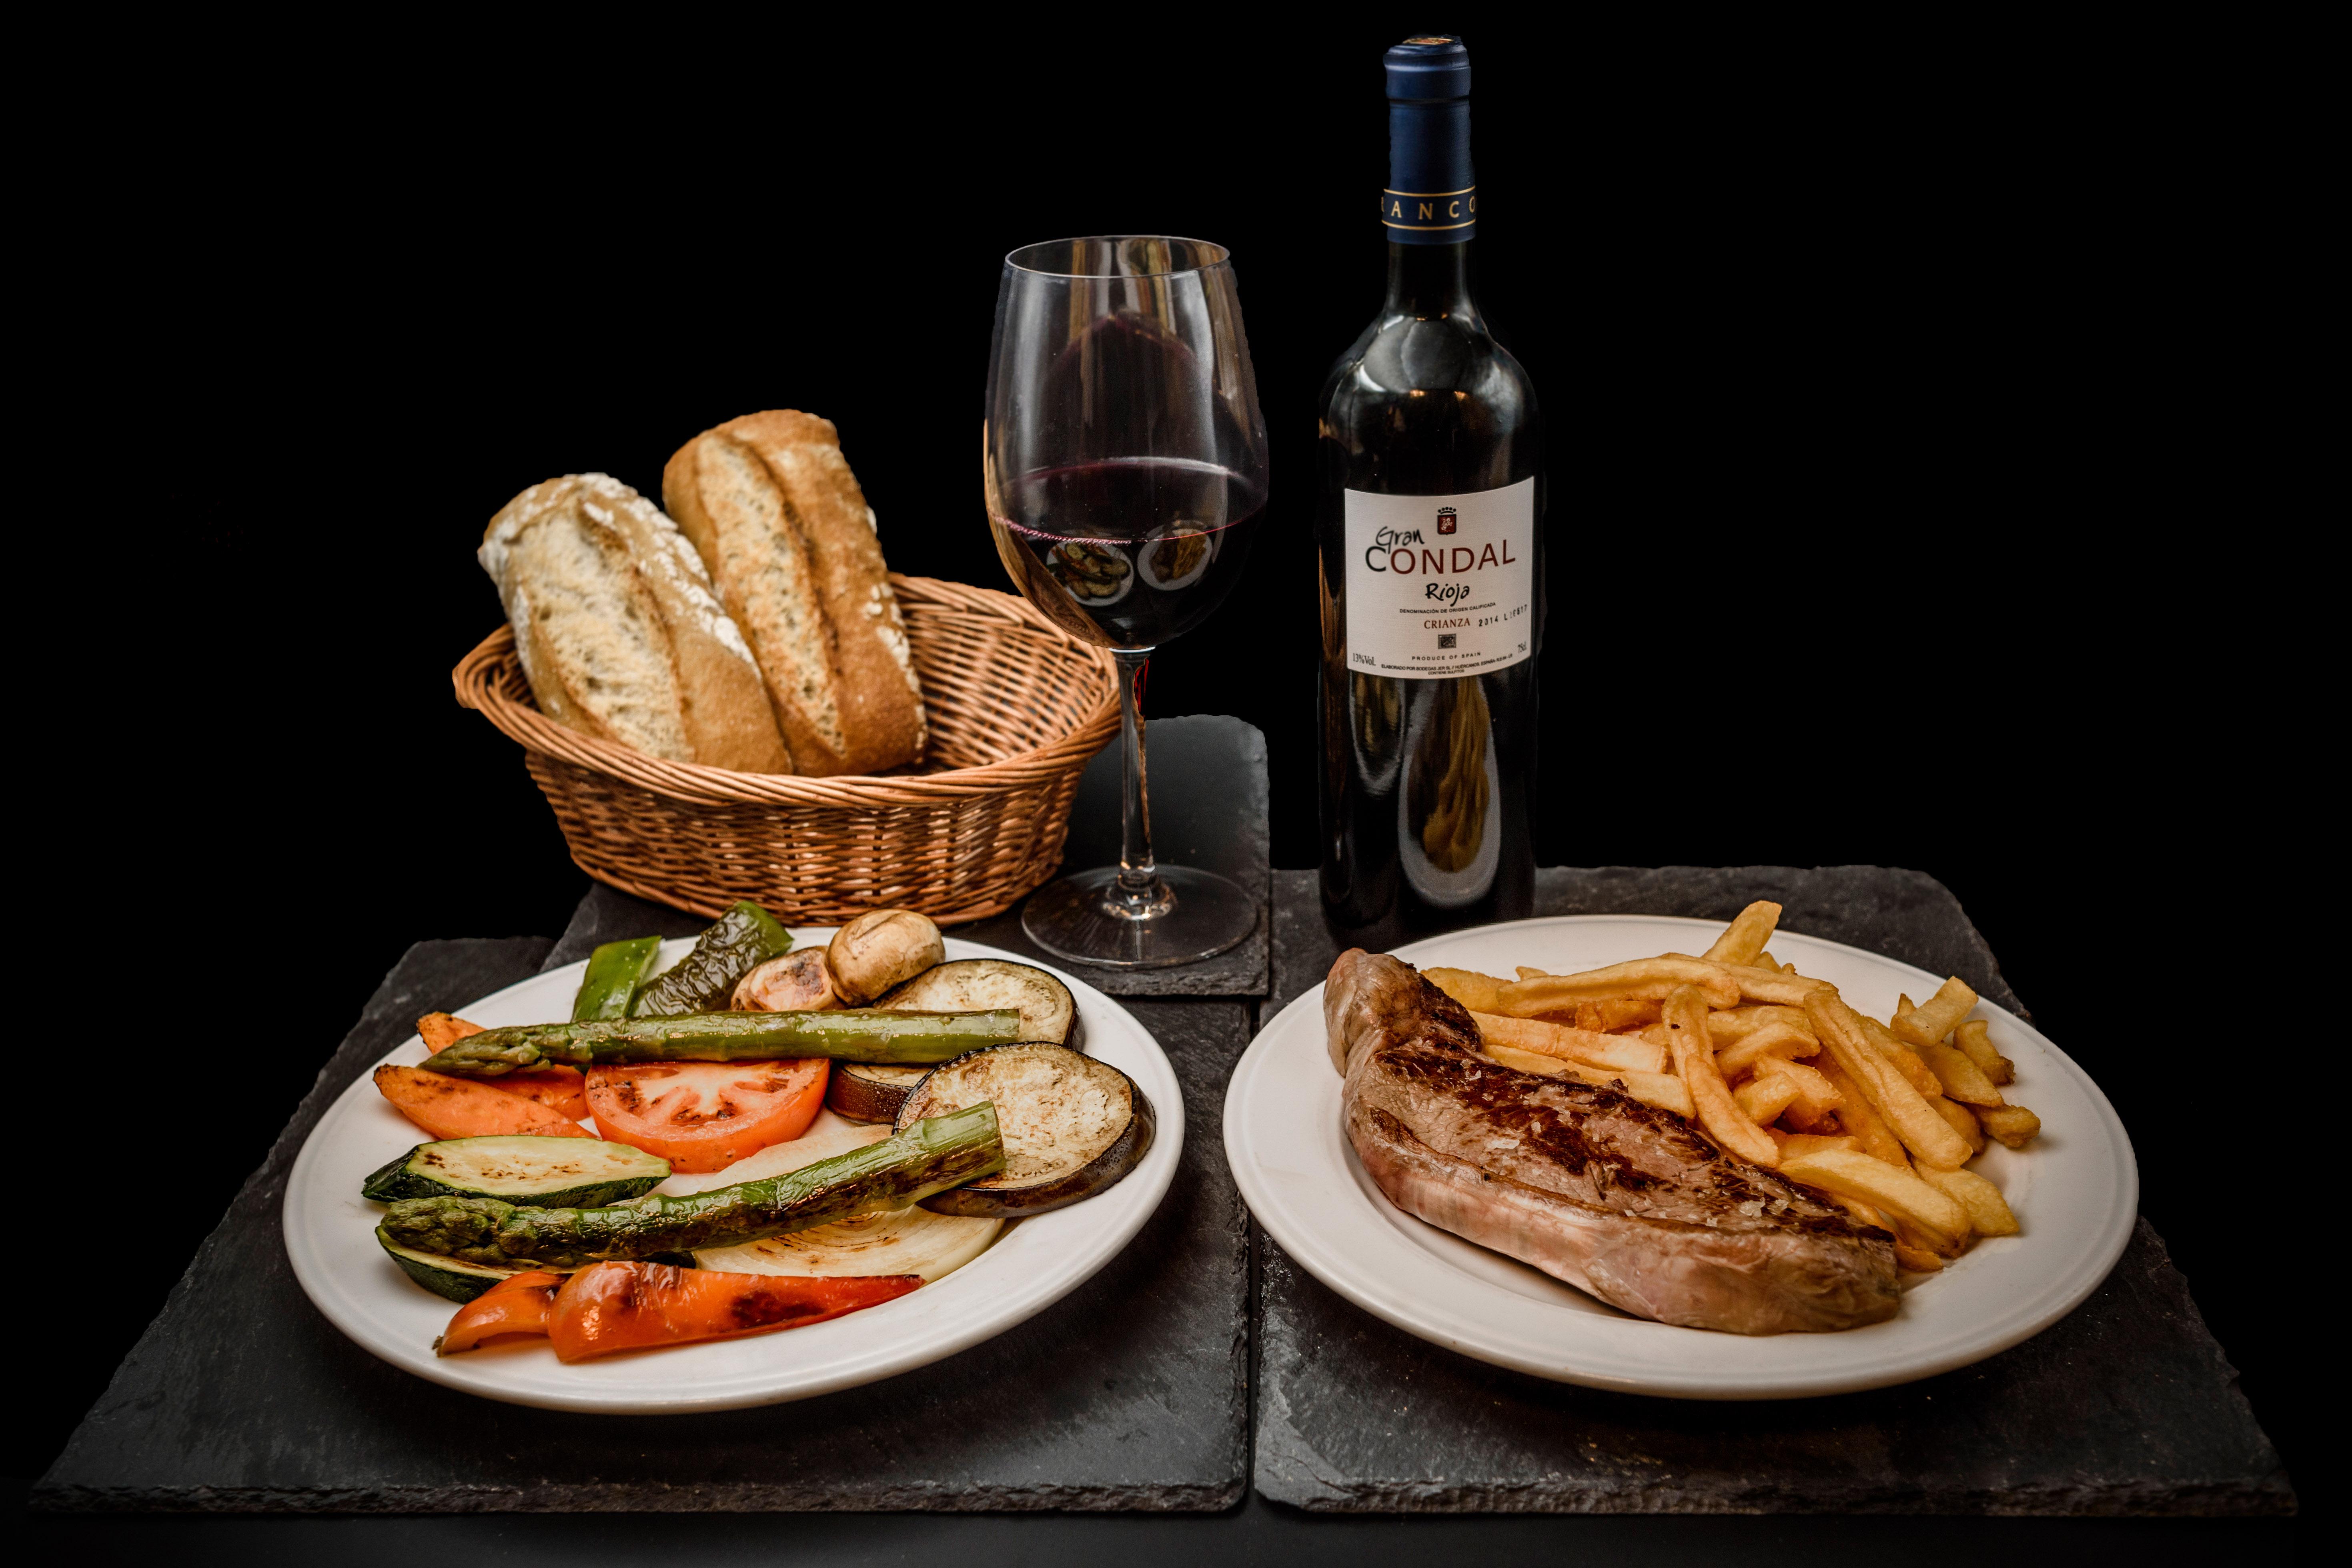 Ofertas Restaurantes Alcorcón. Oferta Entrecot, parrillada de verdura, acá de cerveza o botella de vino valdepeñas de 3/8 de litro y pan. Restaurante Museo del Jamón Parque Oeste Alcorcón